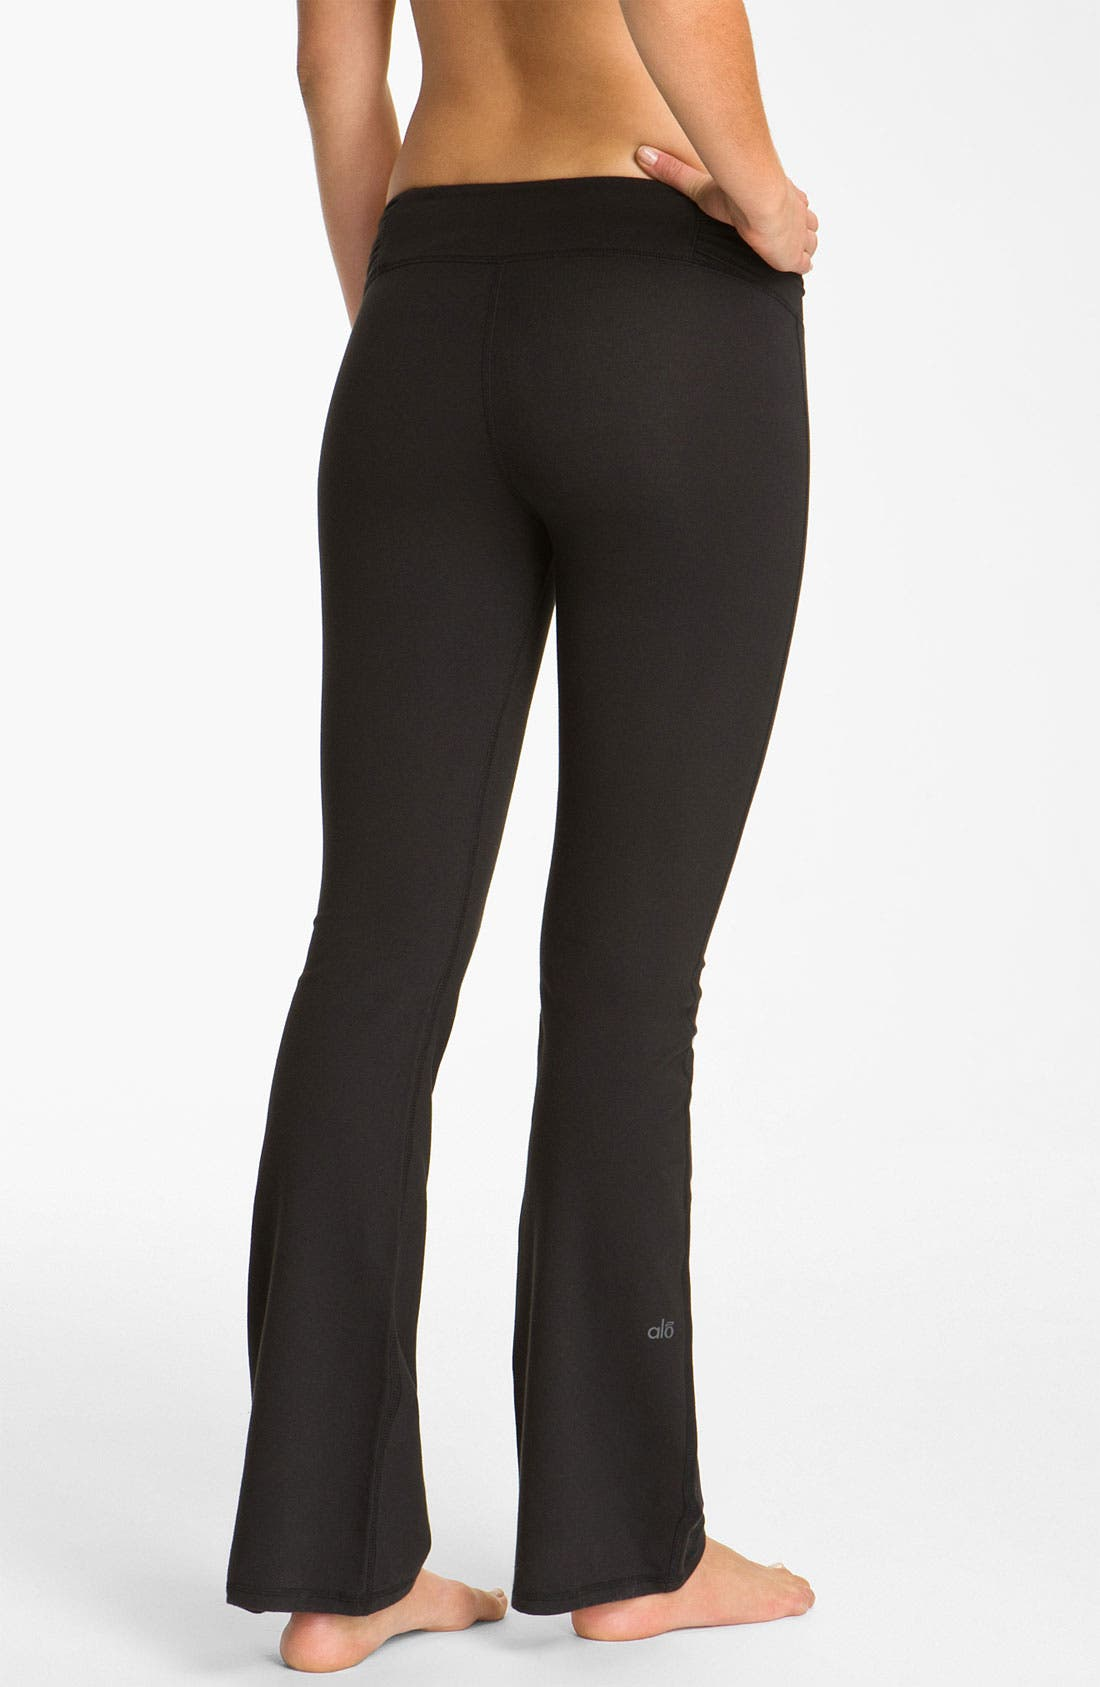 Alternate Image 2  - Alo 'Asana' Yoga Pants